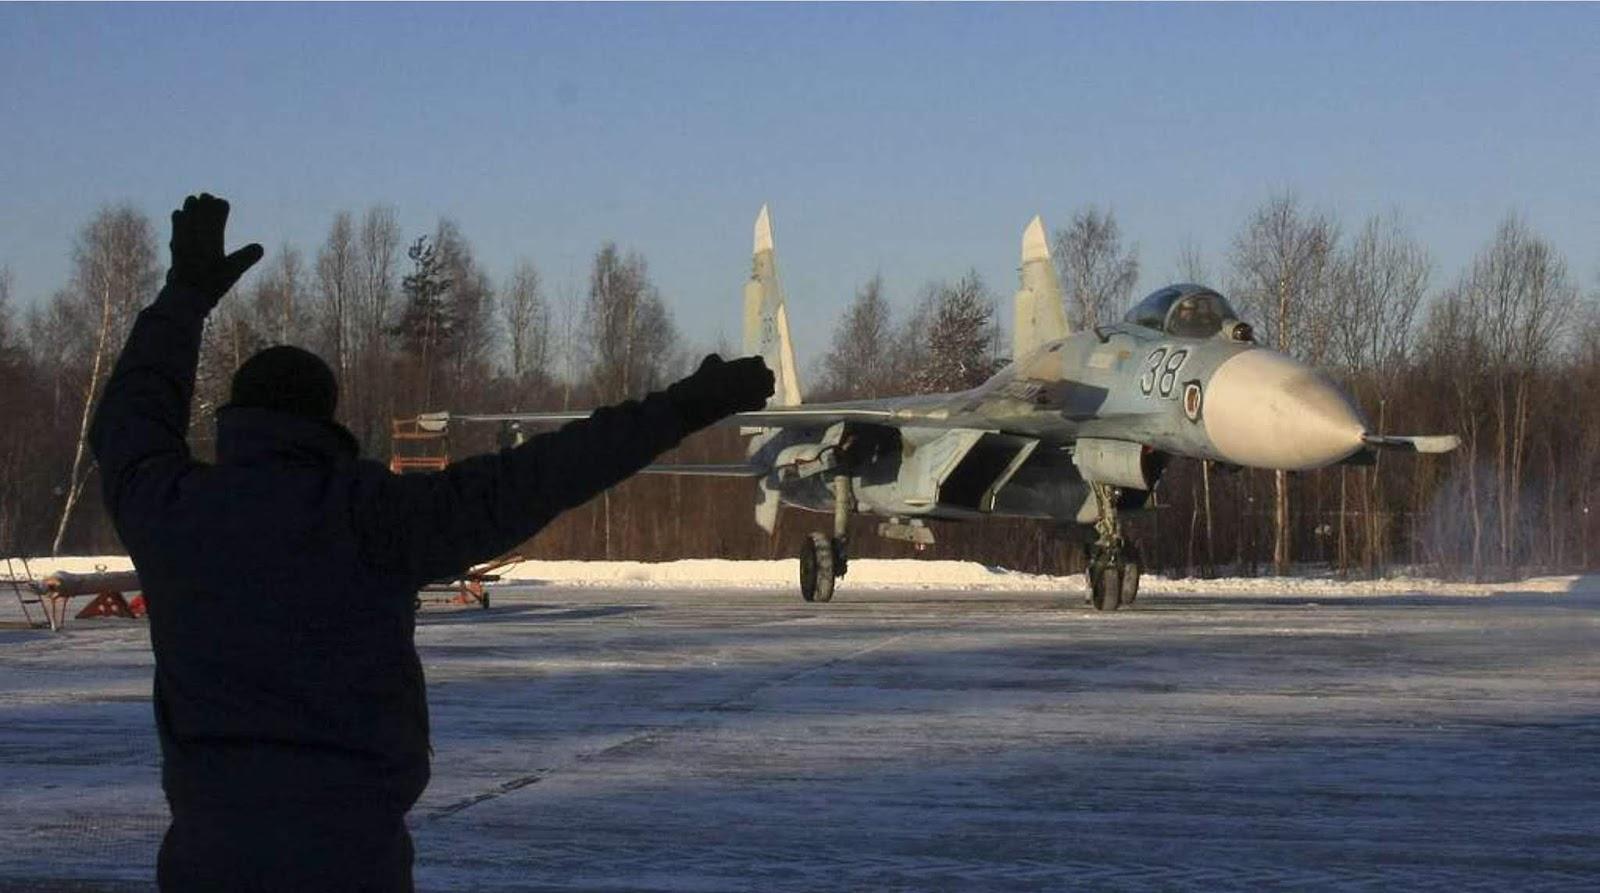 Pesawat tempur Su-27 memaksa pesawat pengintai AS untuk mundur dari perbatasan Rusia